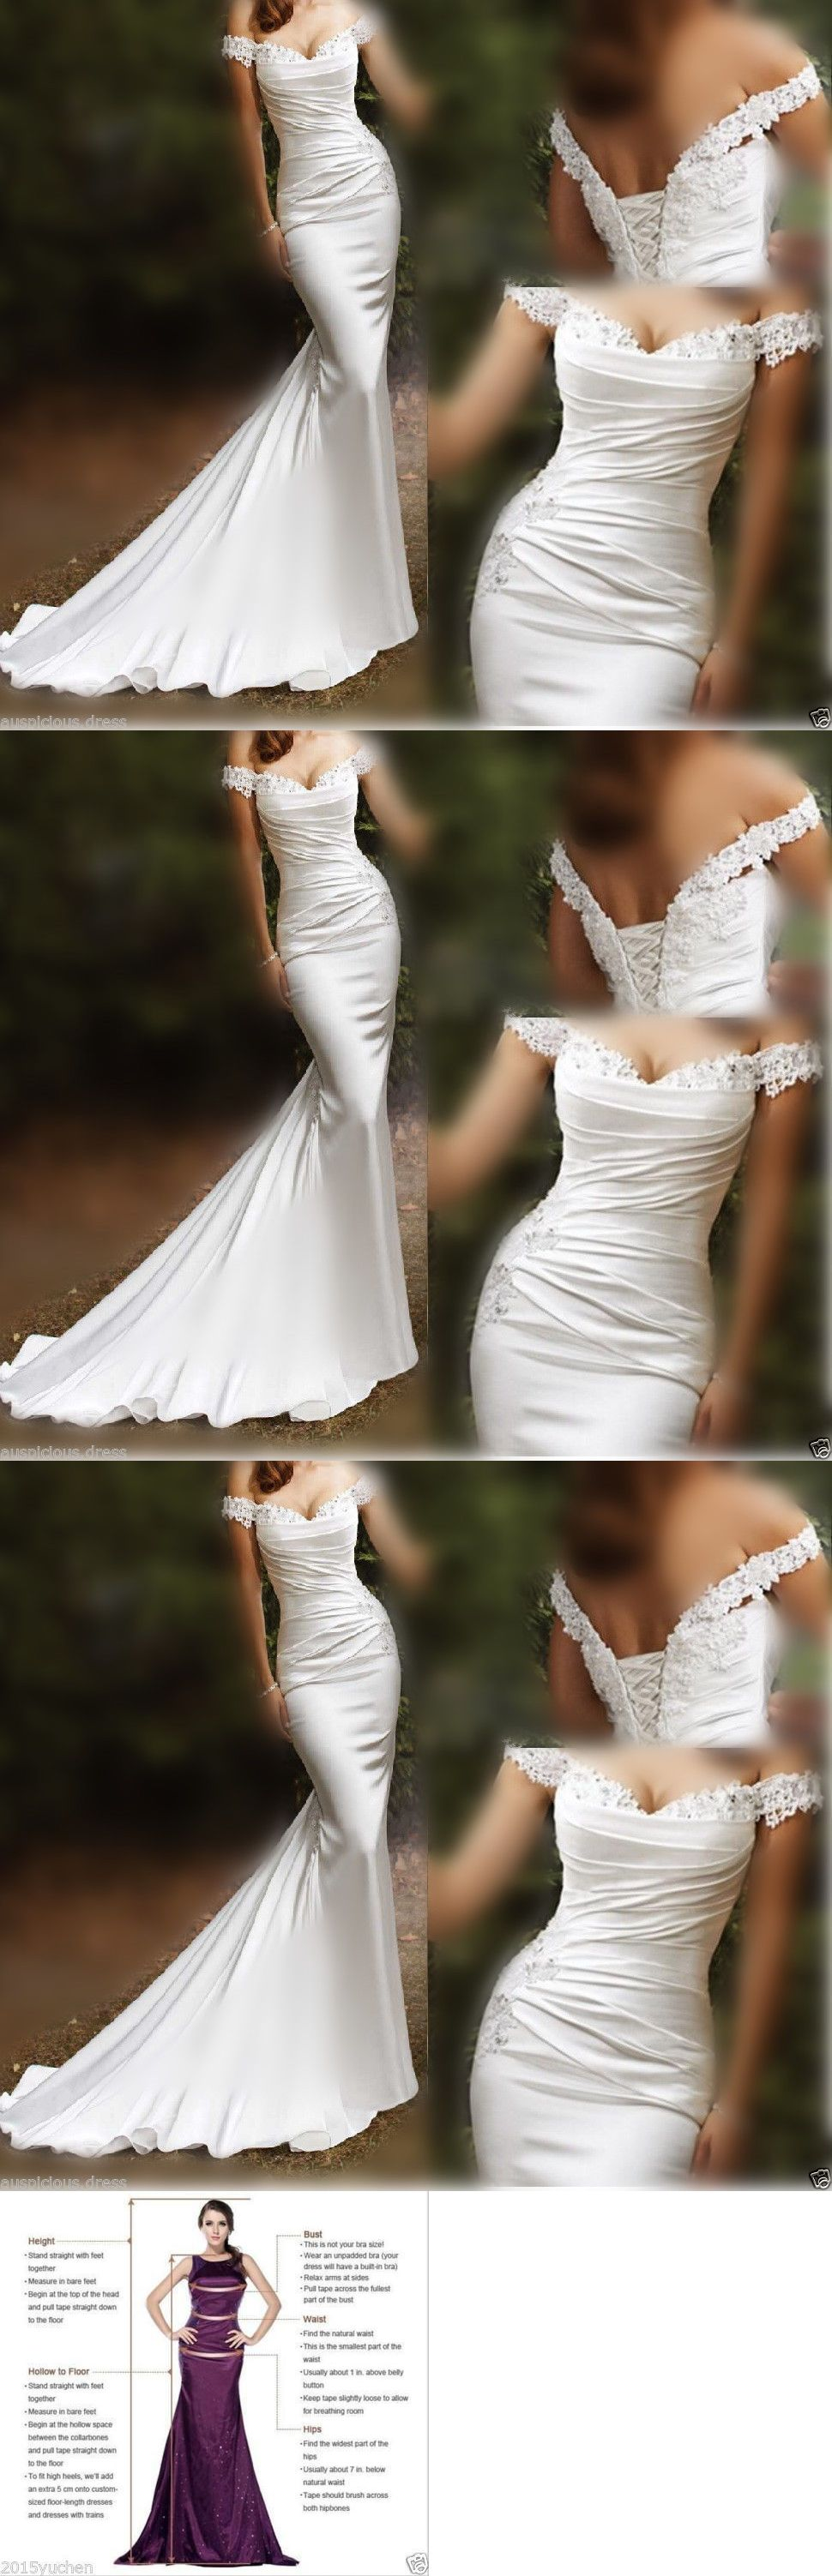 Best wedding dress for size 20  Wedding Dresses Mermaid White Ivory Wedding Dress Bridal Gown